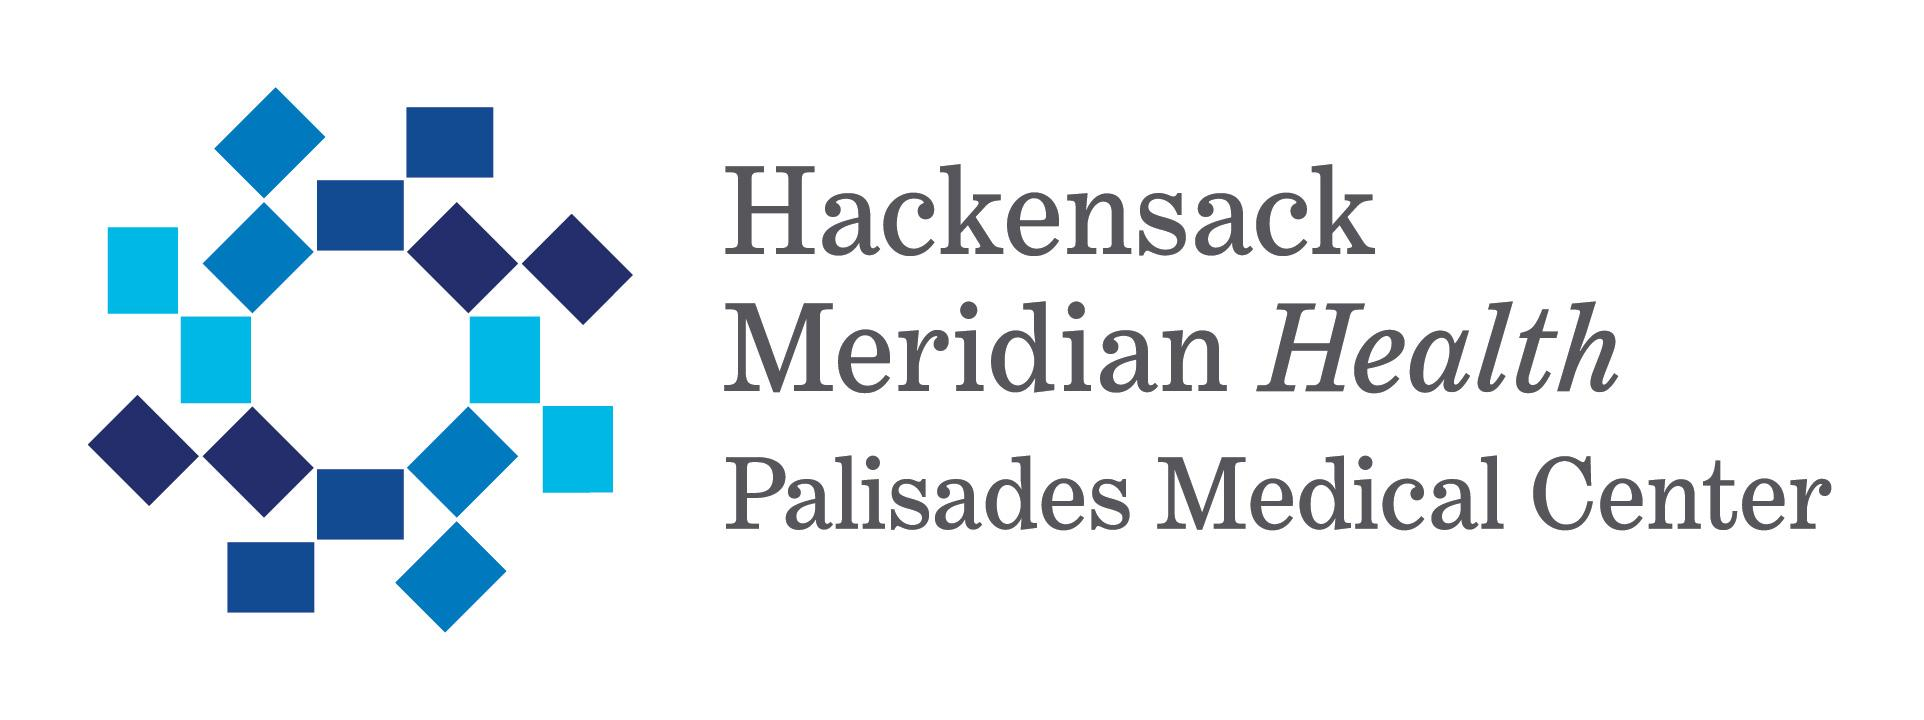 Hackensack Meridian Health - Palisades - HackensackUMC Palisades